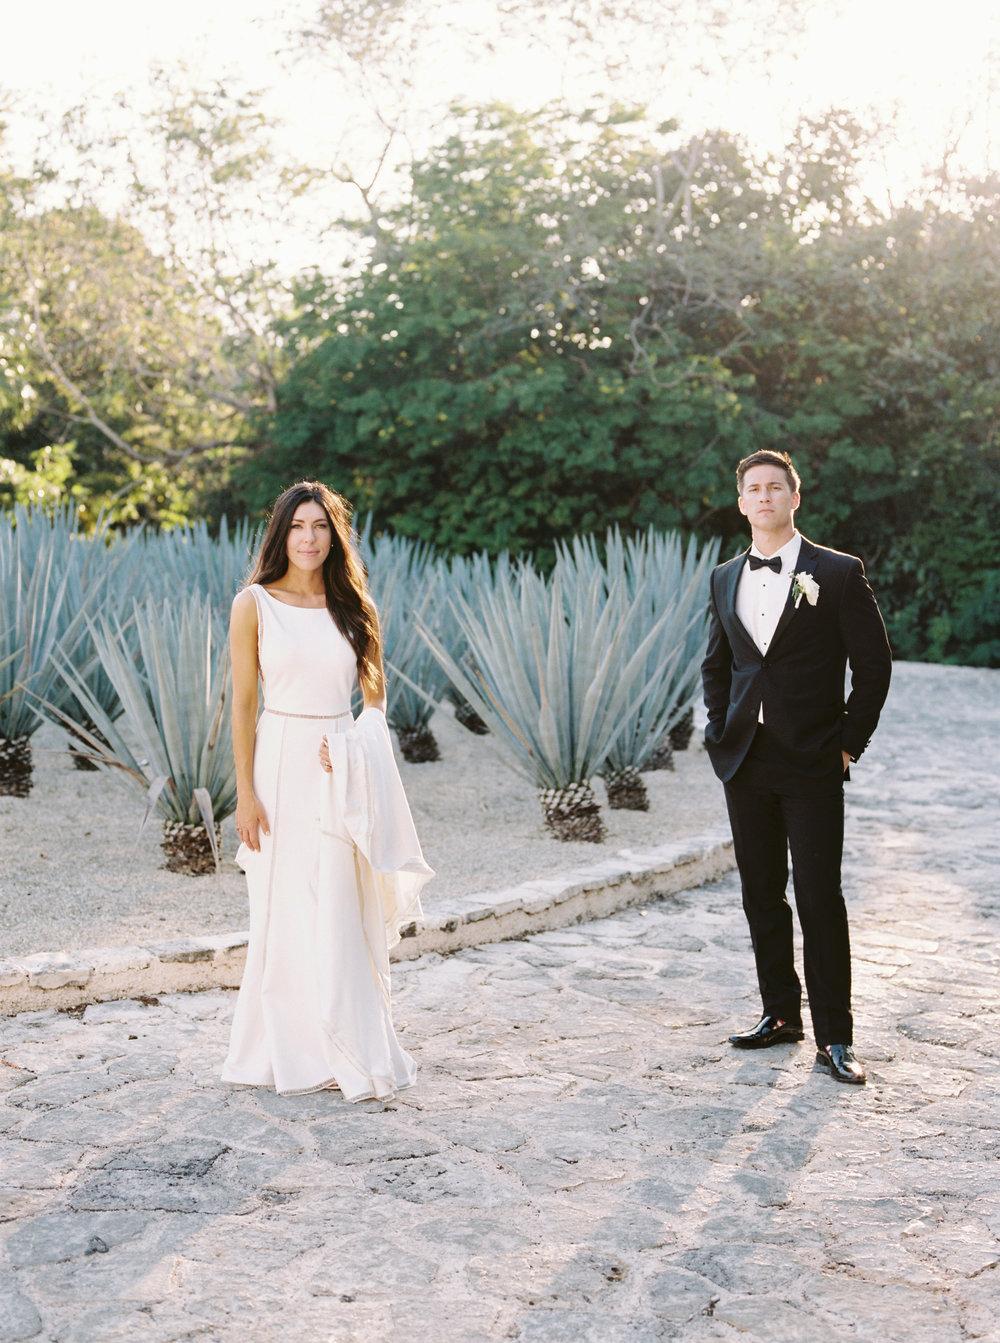 Kyle John l Fine Art Wedding Photography l Chicago, Copenhagen, California, New York, Destination l Blog l Brooke Boyd_The Film Poets_Tulum Wedding_24